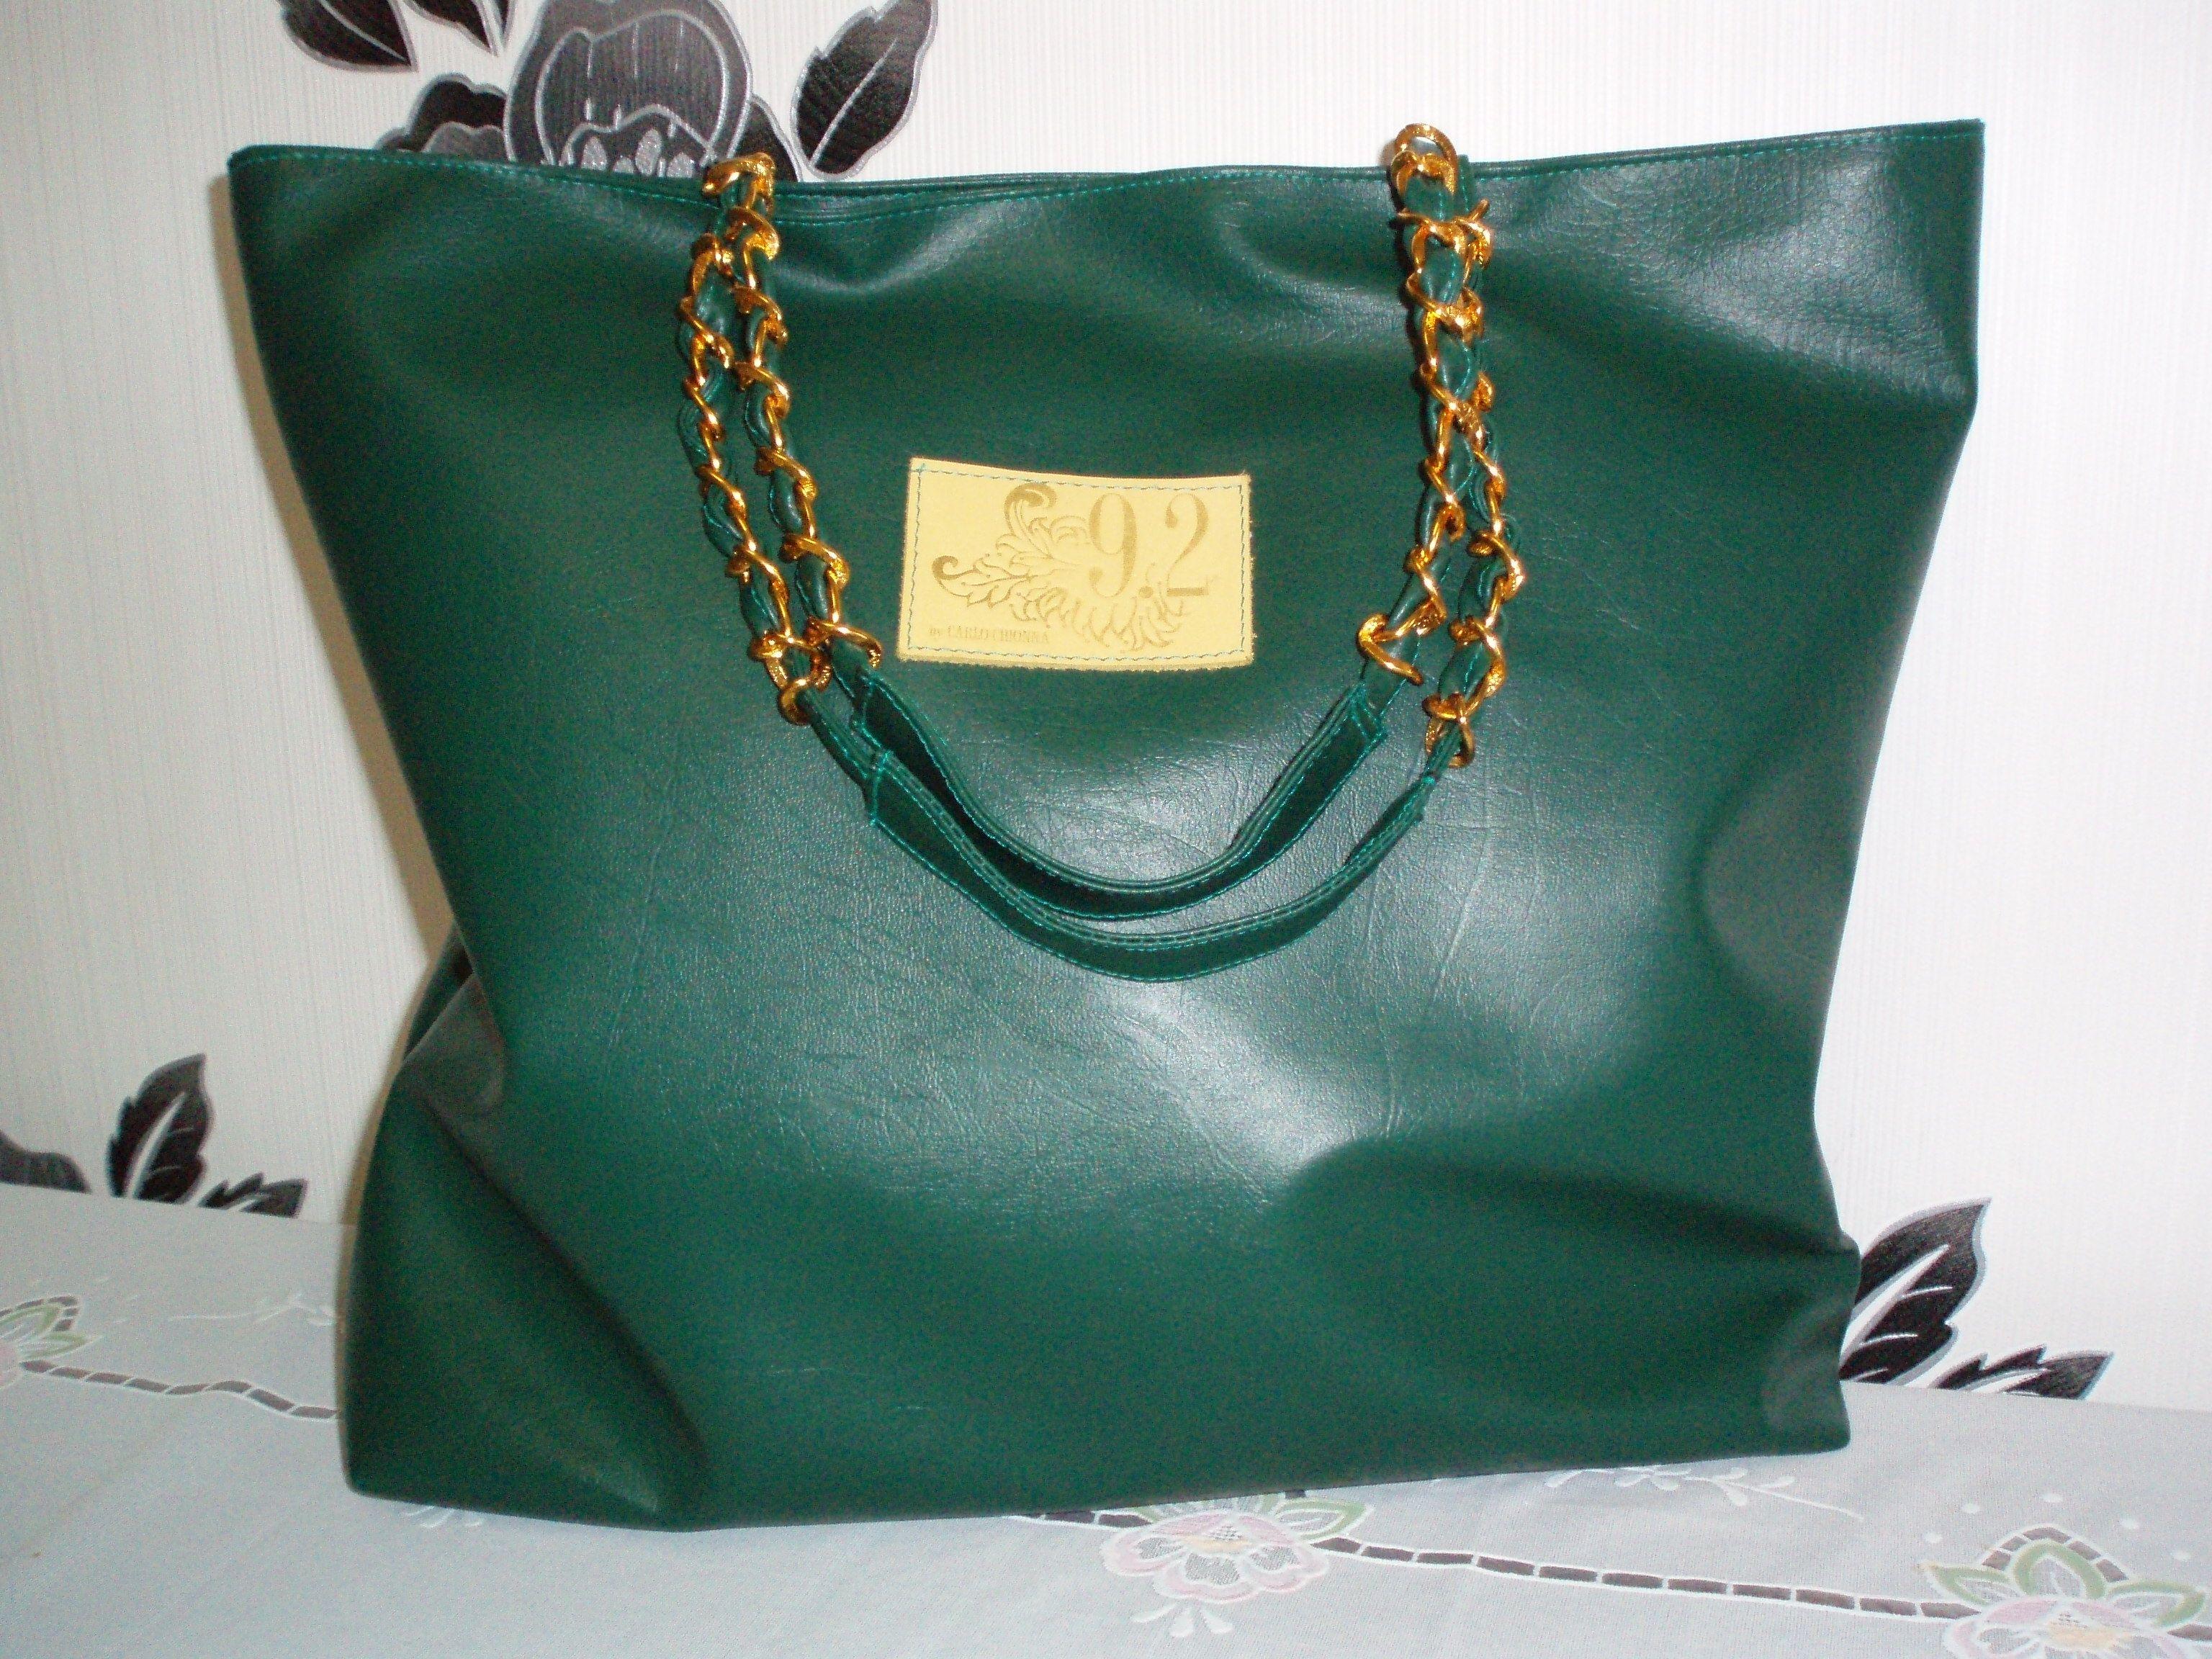 зеленая сумка с цепочками